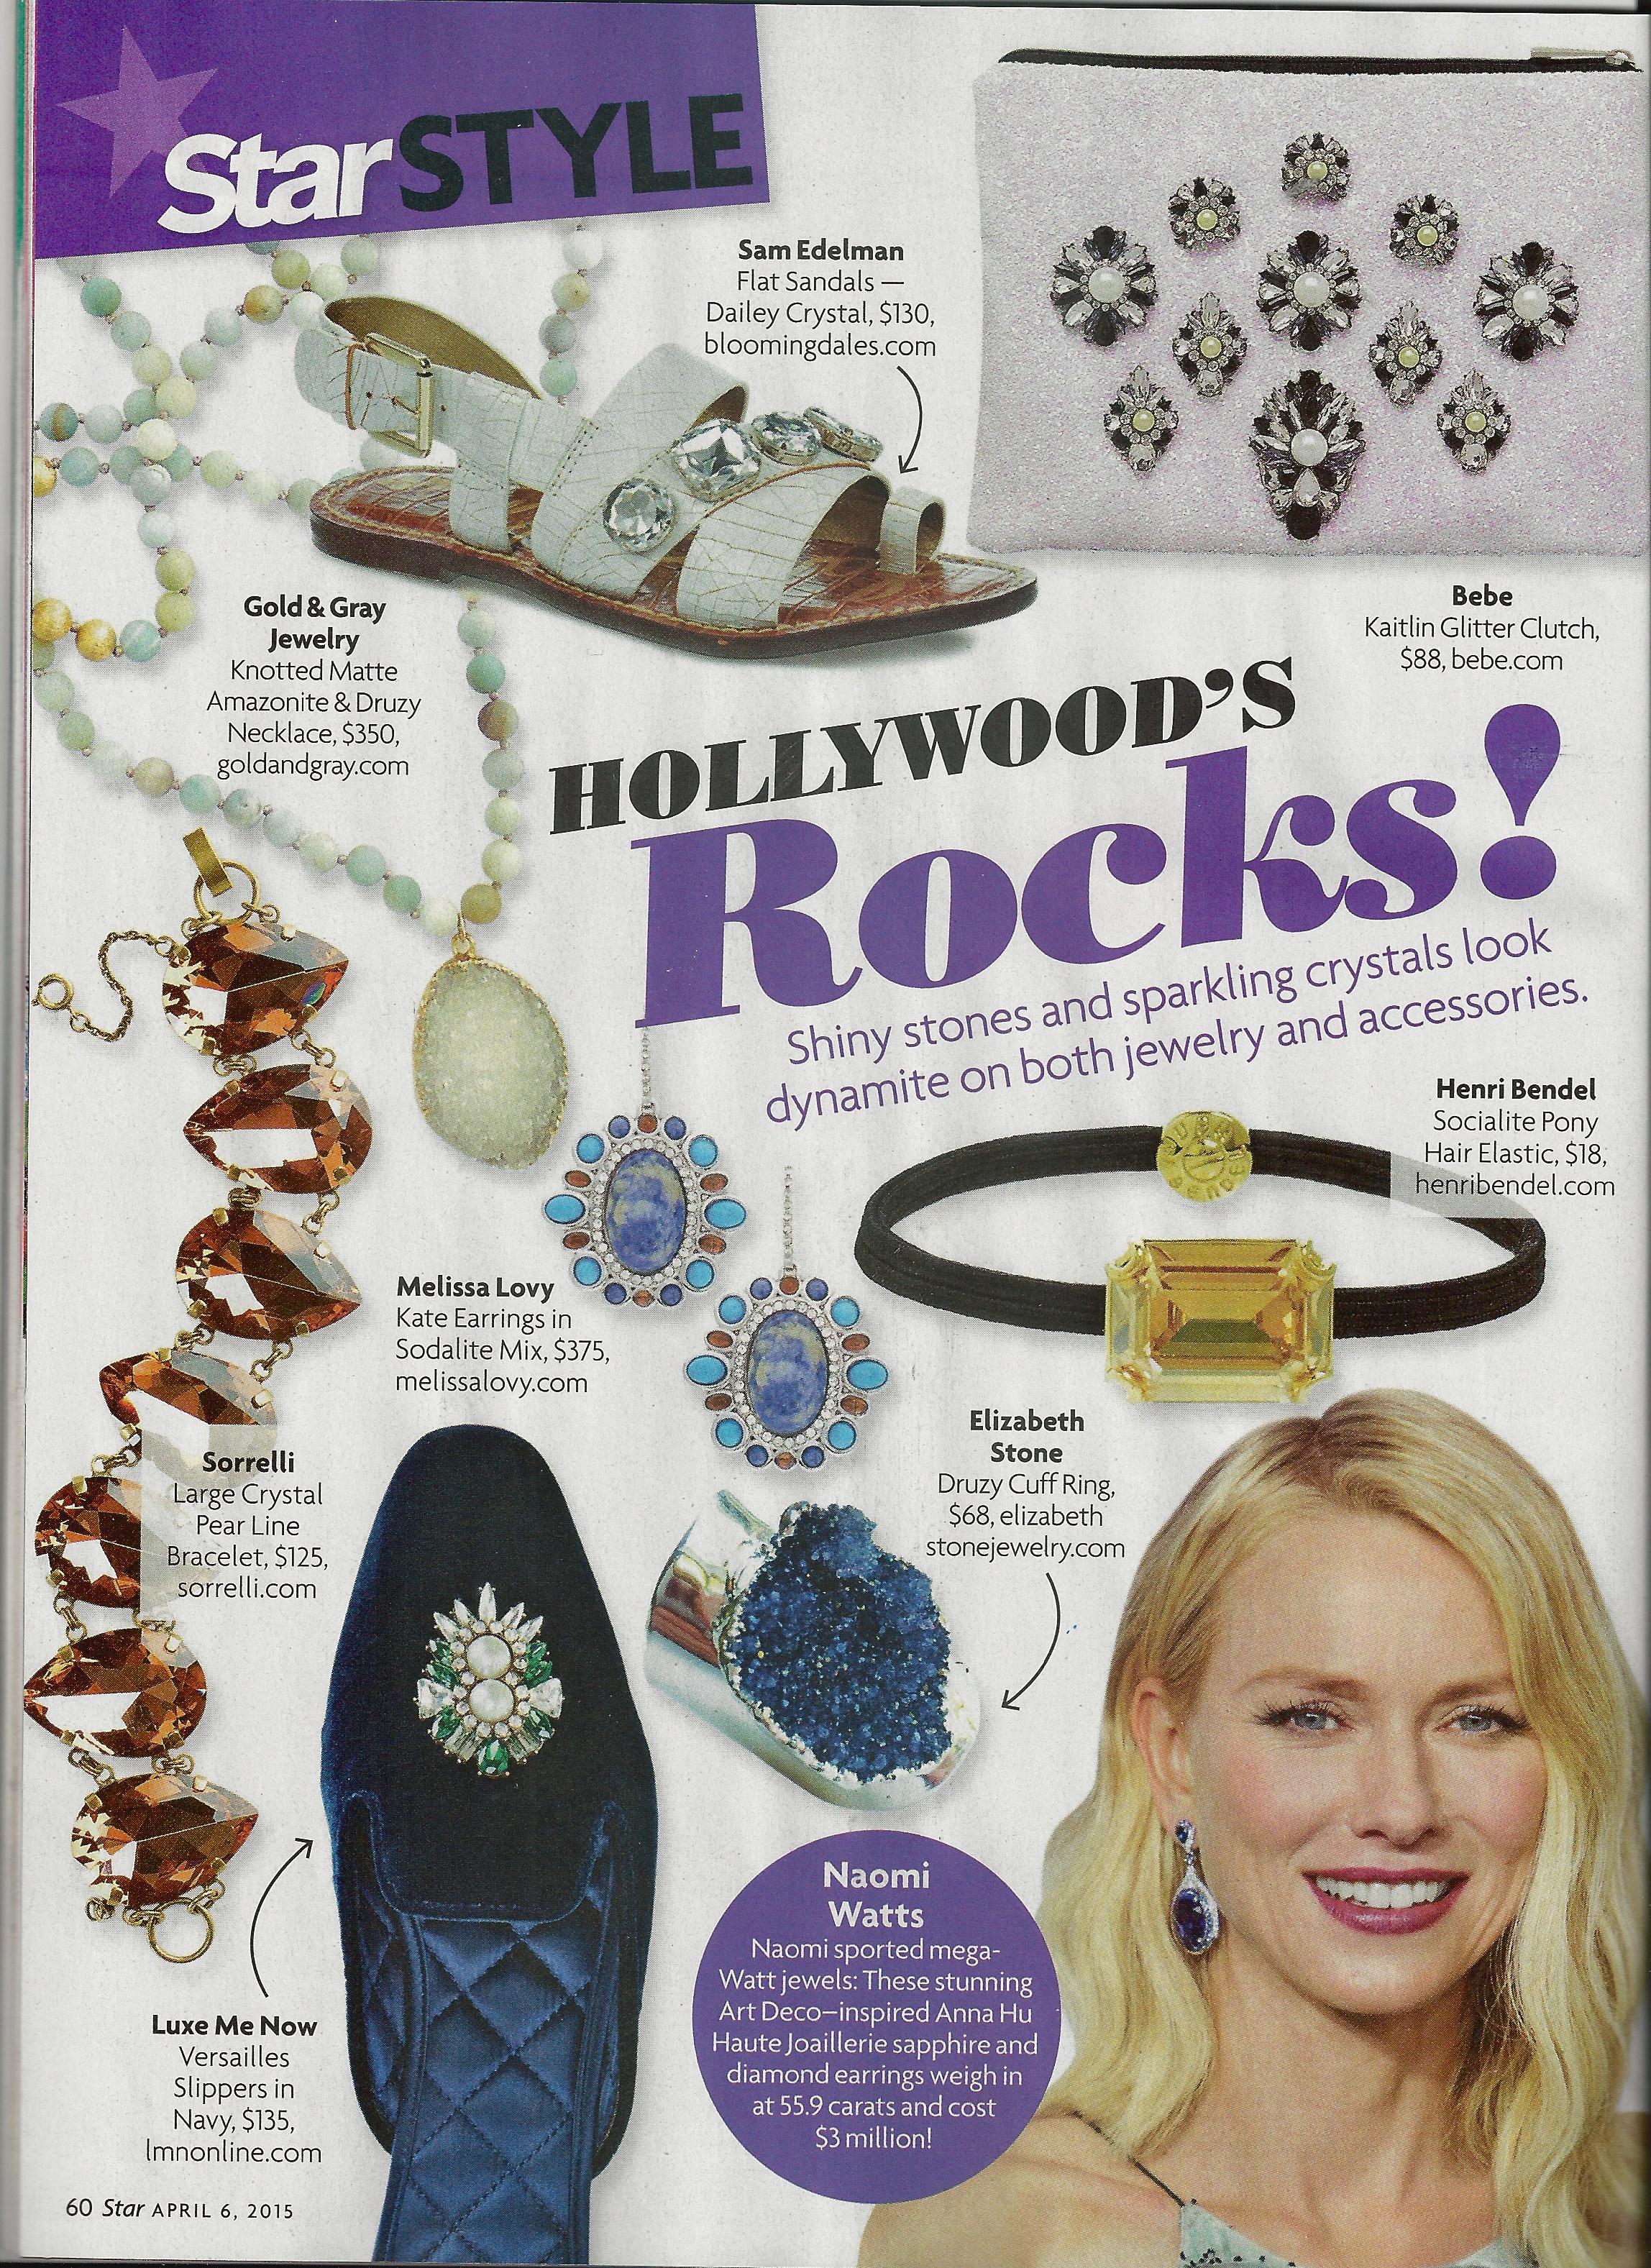 Star_Magazine_LMN_3.25.15.jpeg